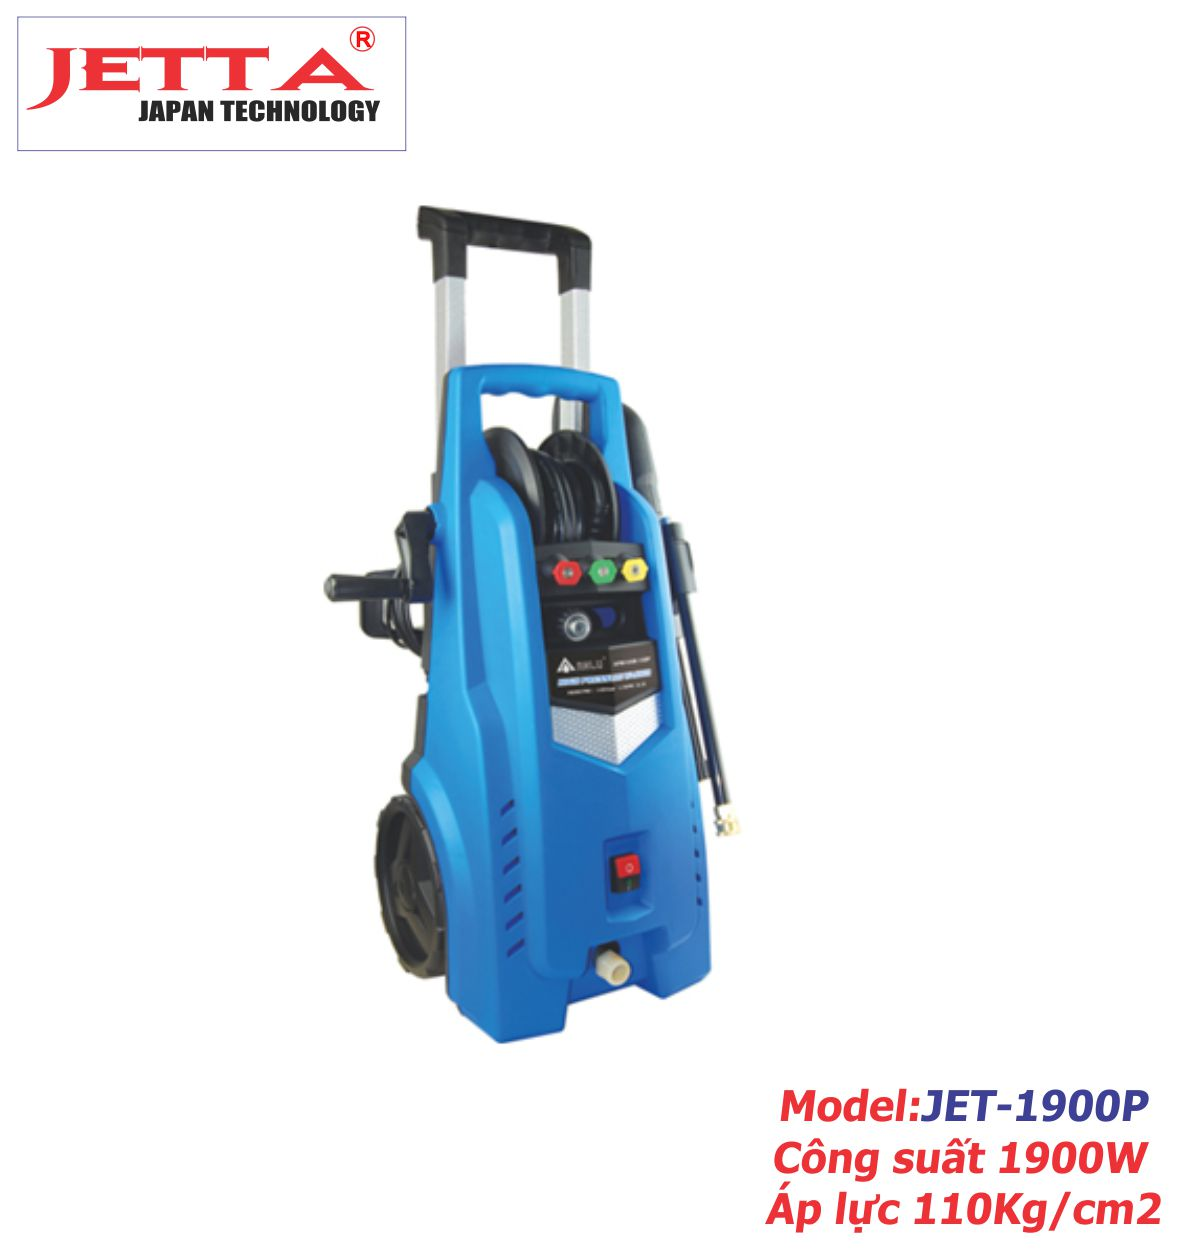 Máy rửa xe gia đình JET-1900P